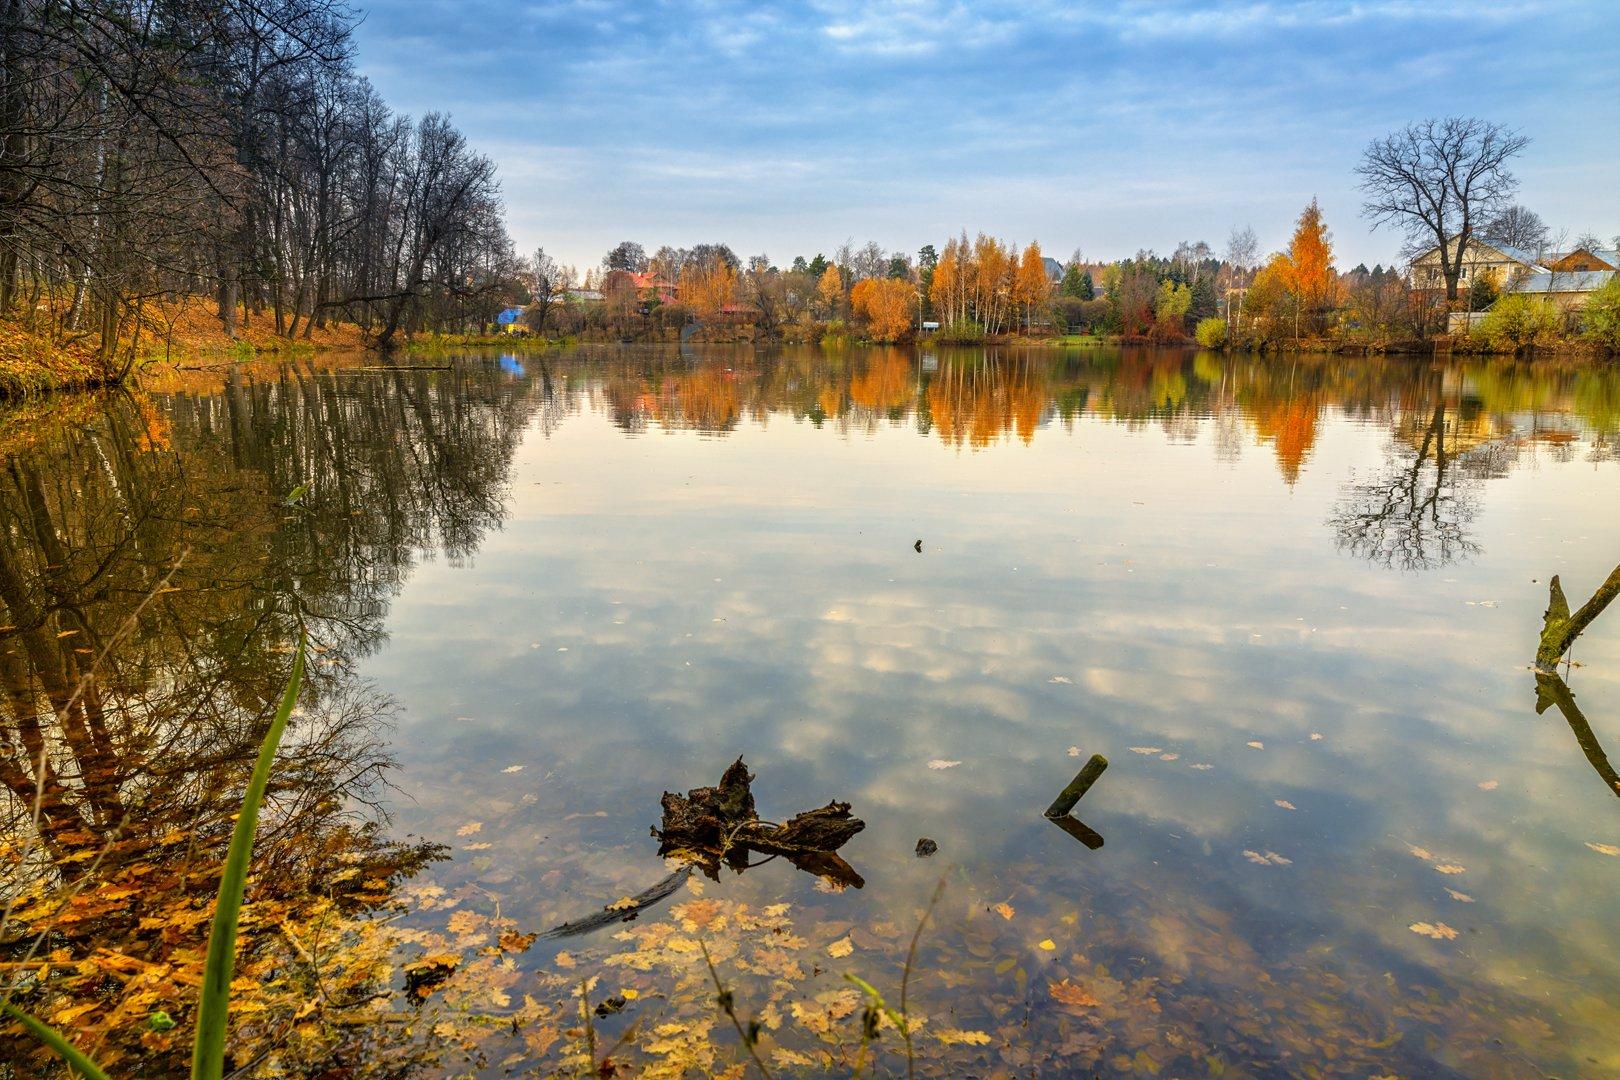 пейзаж, осень, озеро, пруд, желтый, листья, переделкино, landscape, autumn, lake, pond, yellow, leaves, peredelkino, Шурчков Юрий